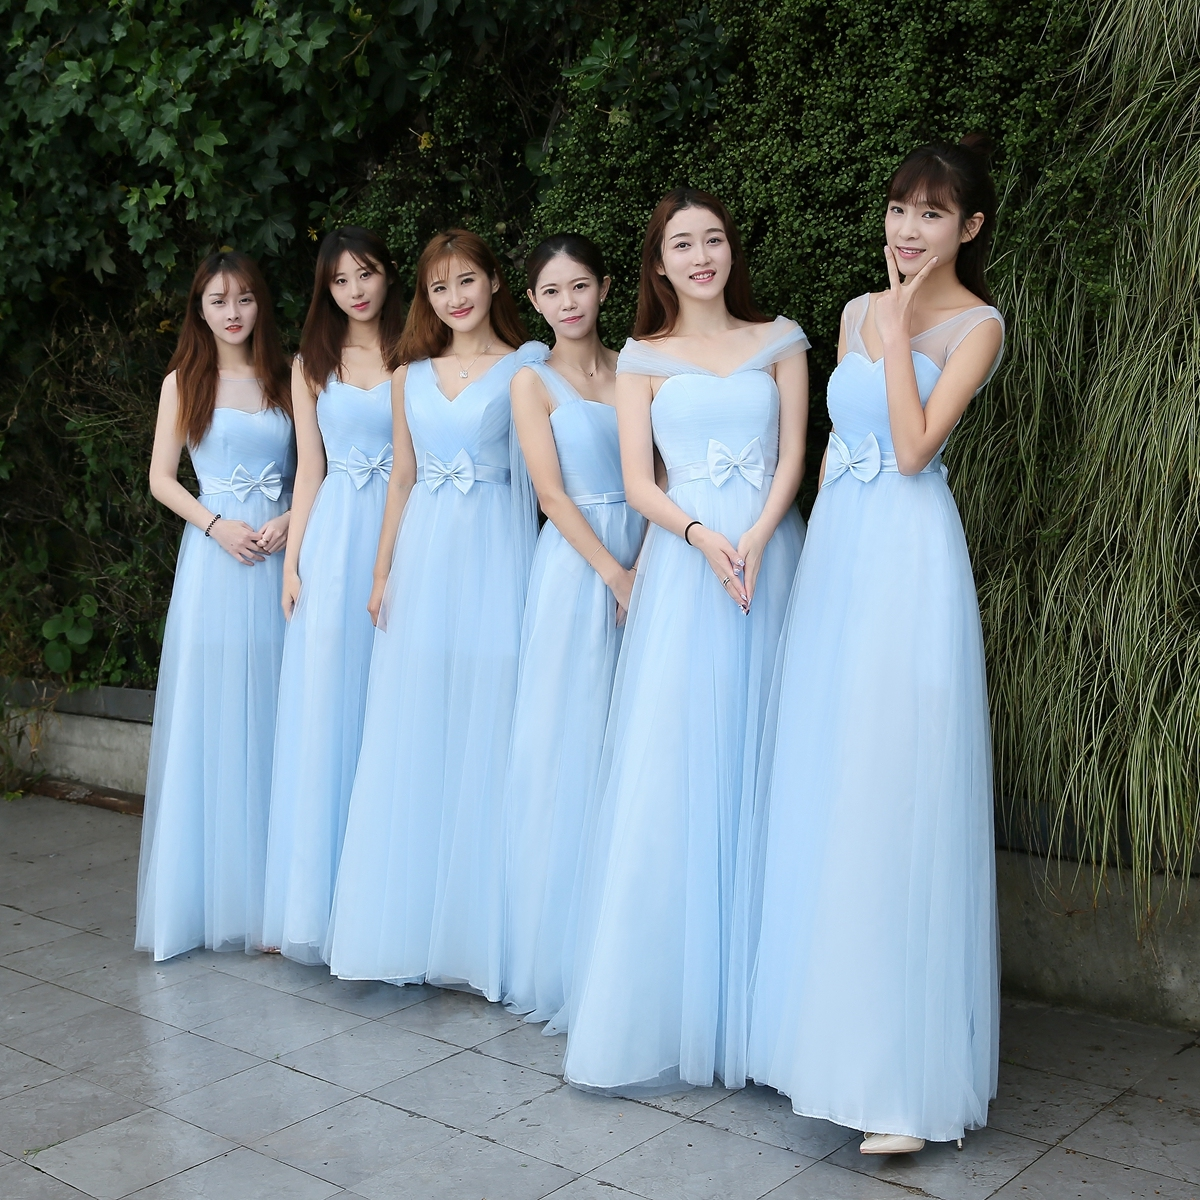 Sky Blue Wedding Guest Dress Elegant Burgundy Bridesmaid Tulle New Years Dress Graduation Long Party Sister Club Prom Princes